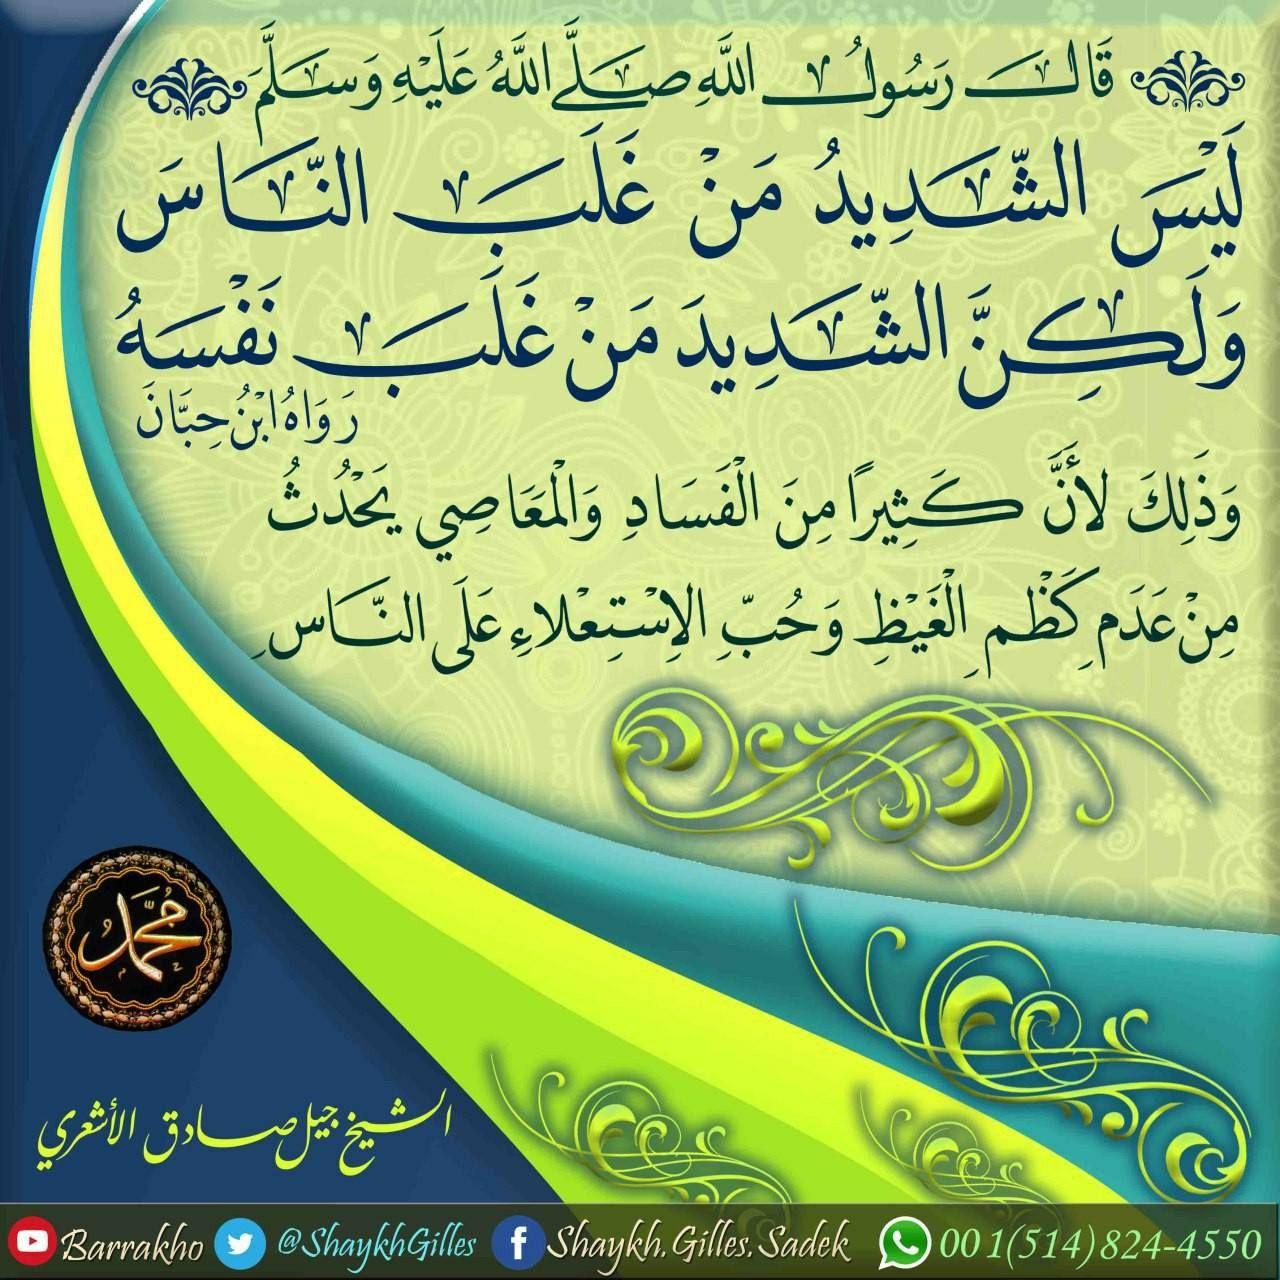 Fb Com Shaykh Gilles Sadek Whatsapp 15148244550 Twitter Shaykhgilles Instagram Shaykhgilles Telegram Shaykh Gilles Sadek H Texts Islam Arabic Calligraphy